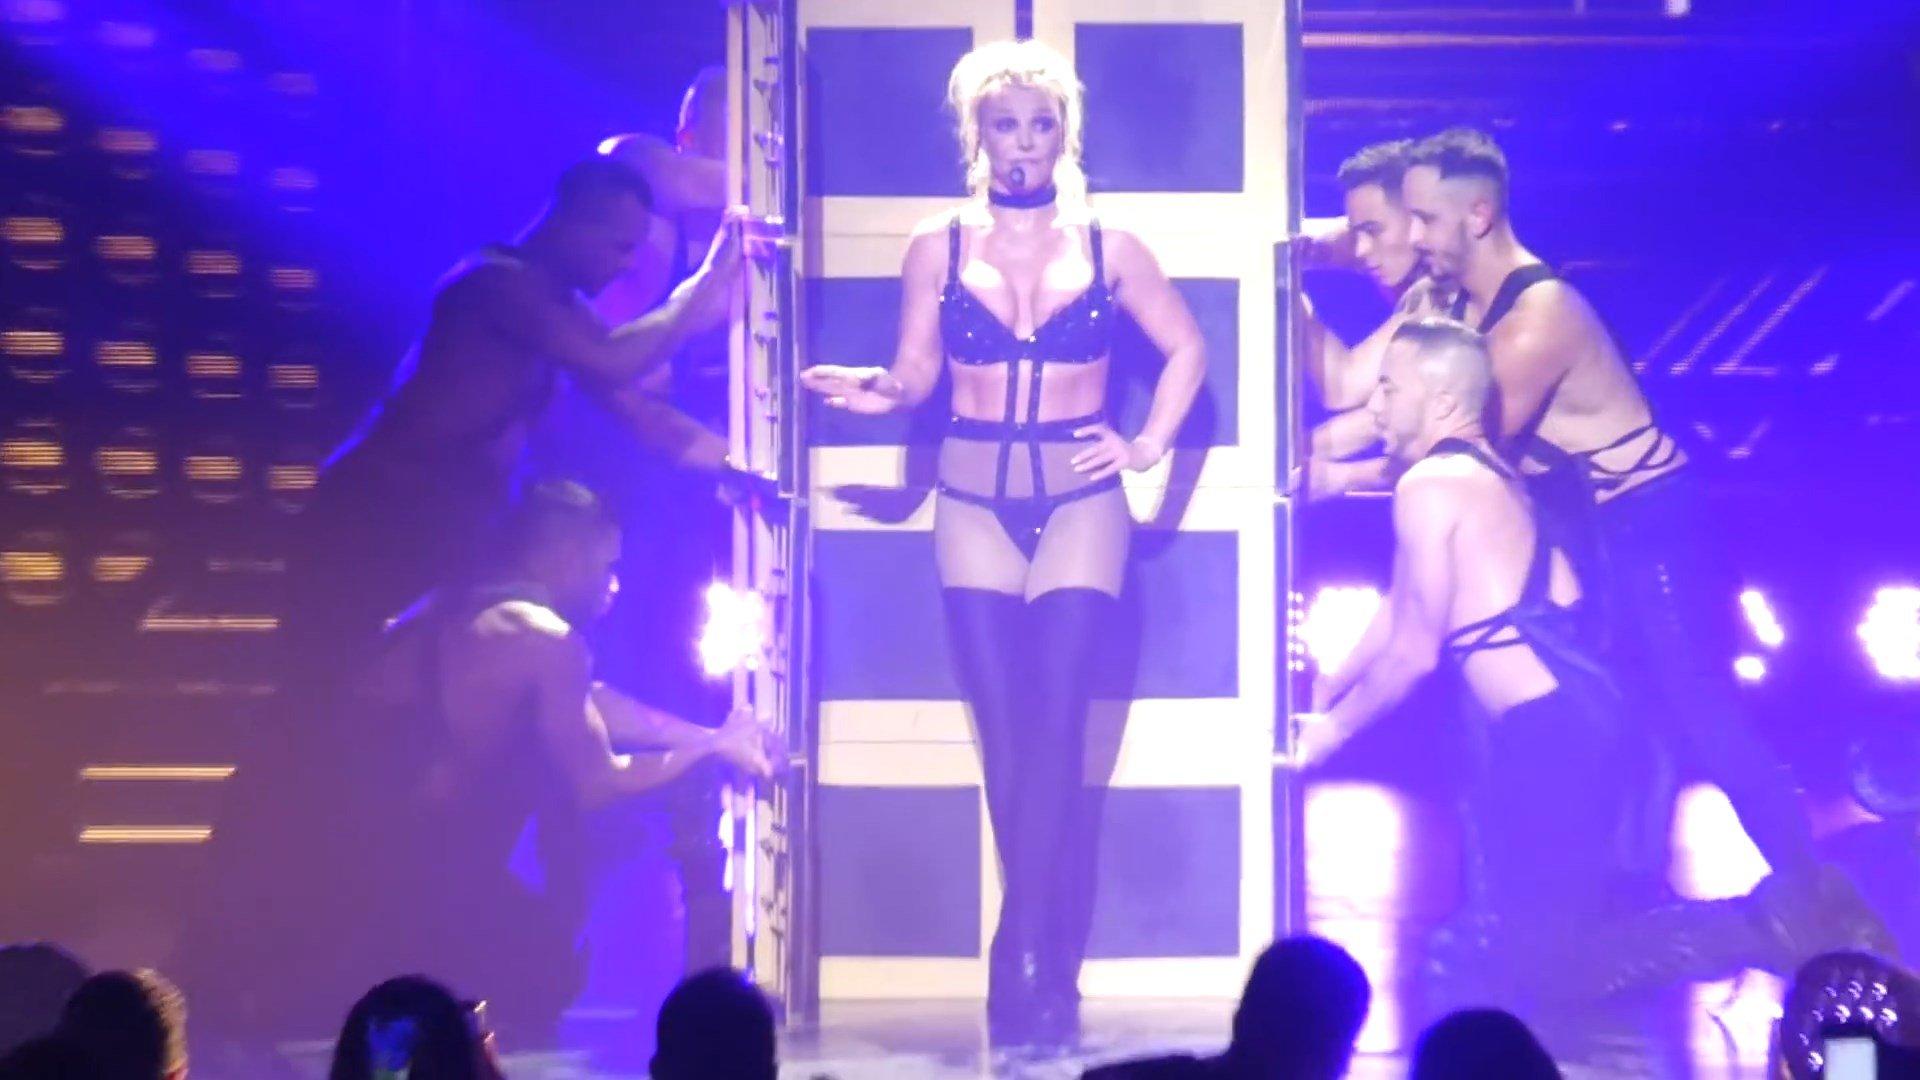 Britney-Spears-Nip-Slip-4-thefappeningblog.com_.jpg